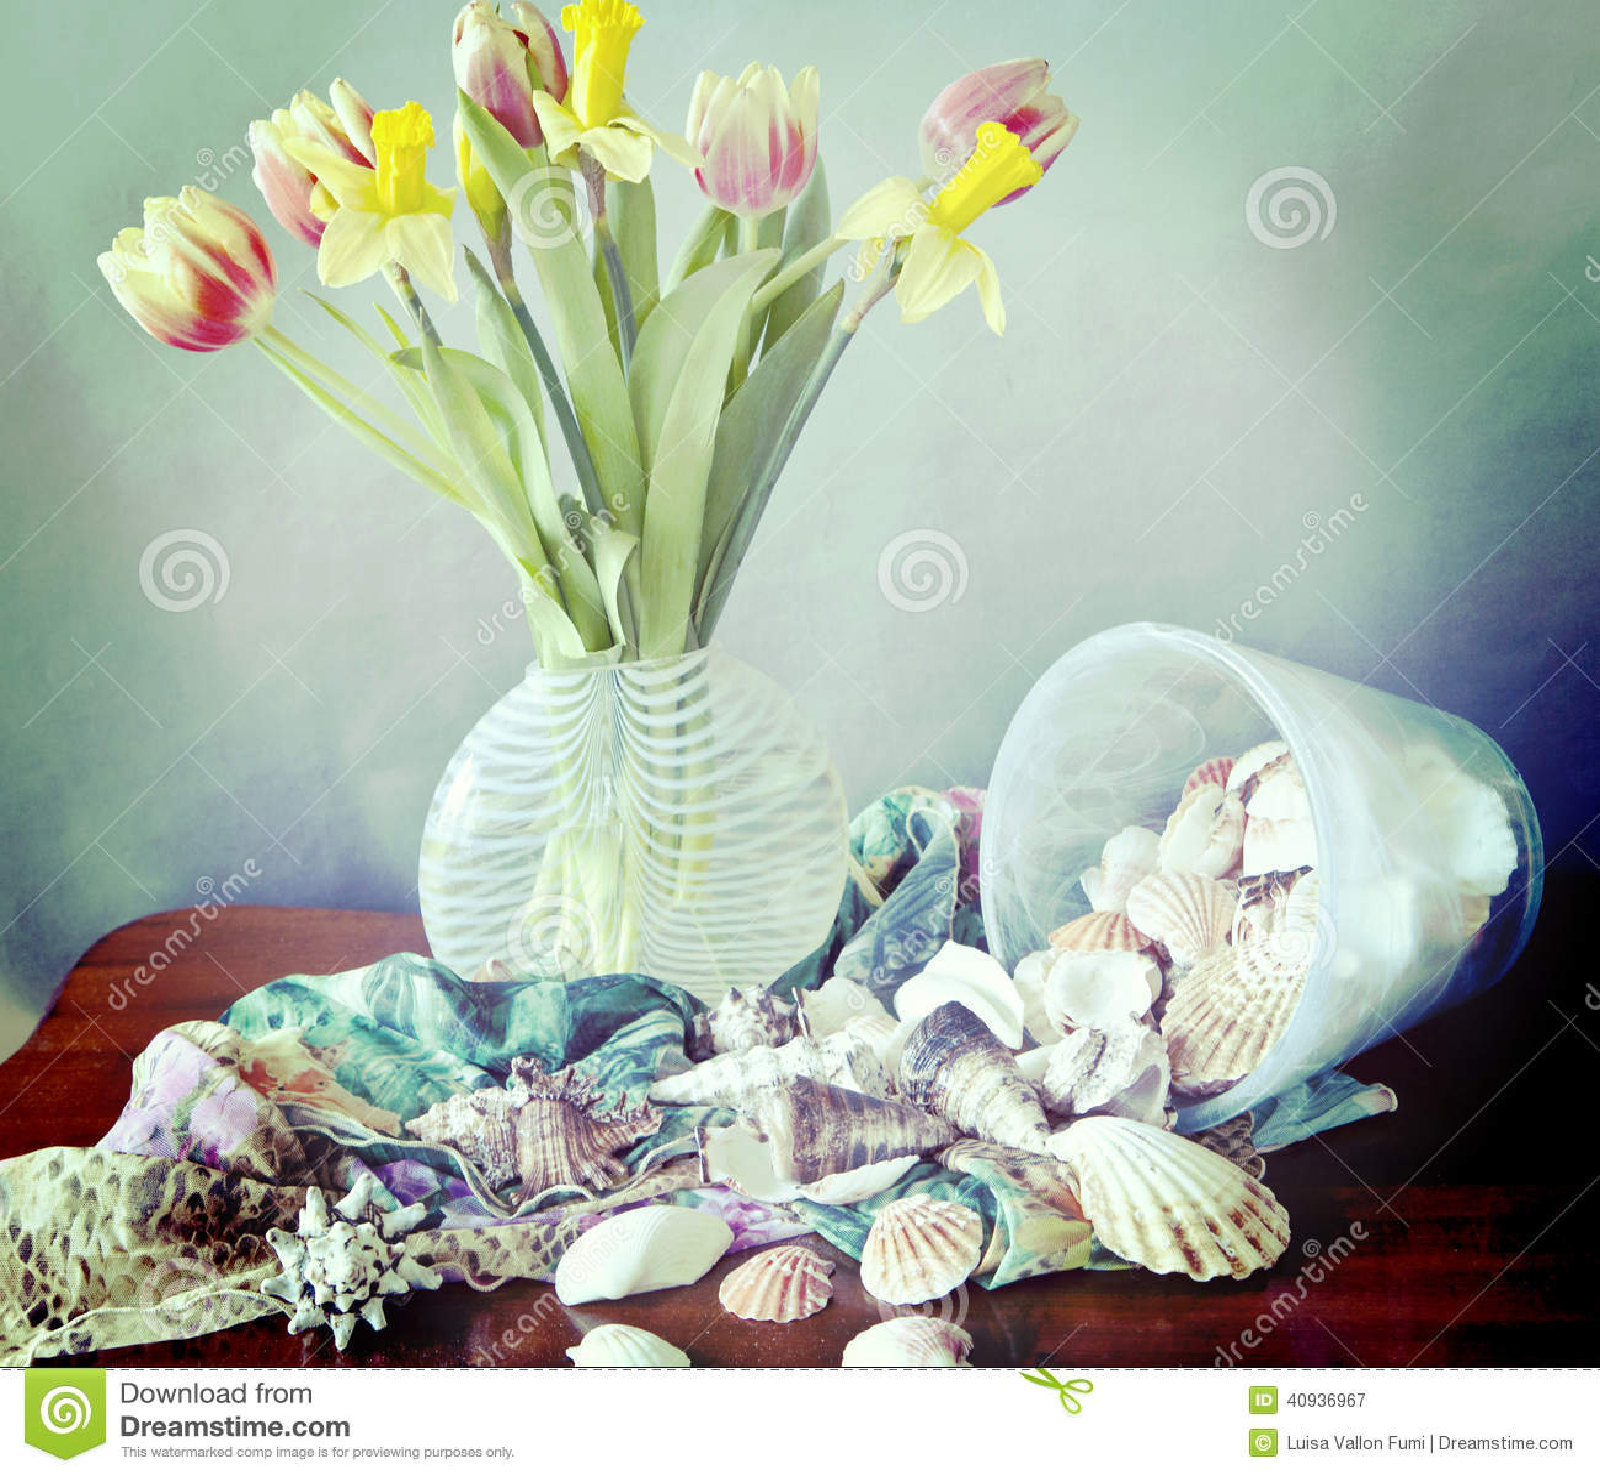 Still lifespring flowers shells and silk scarves stock image still lifespring flowers shells and silk scarves mightylinksfo